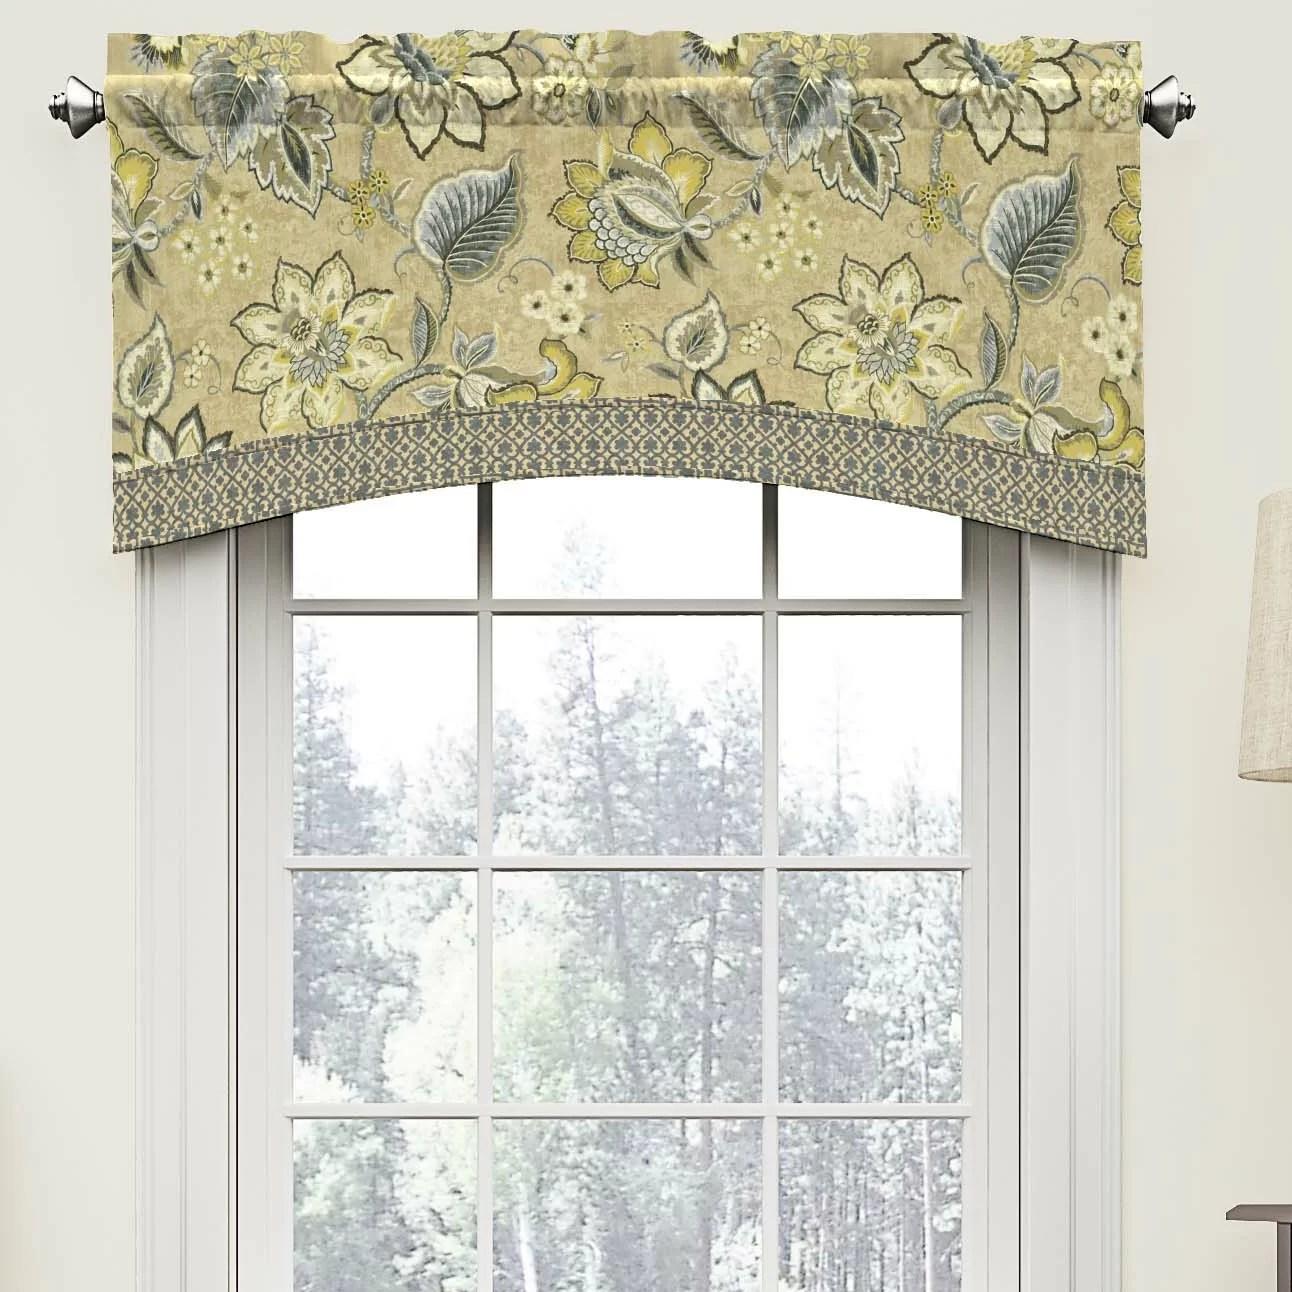 Waverly Brighton Blossom 52 Arched Curtain Valance